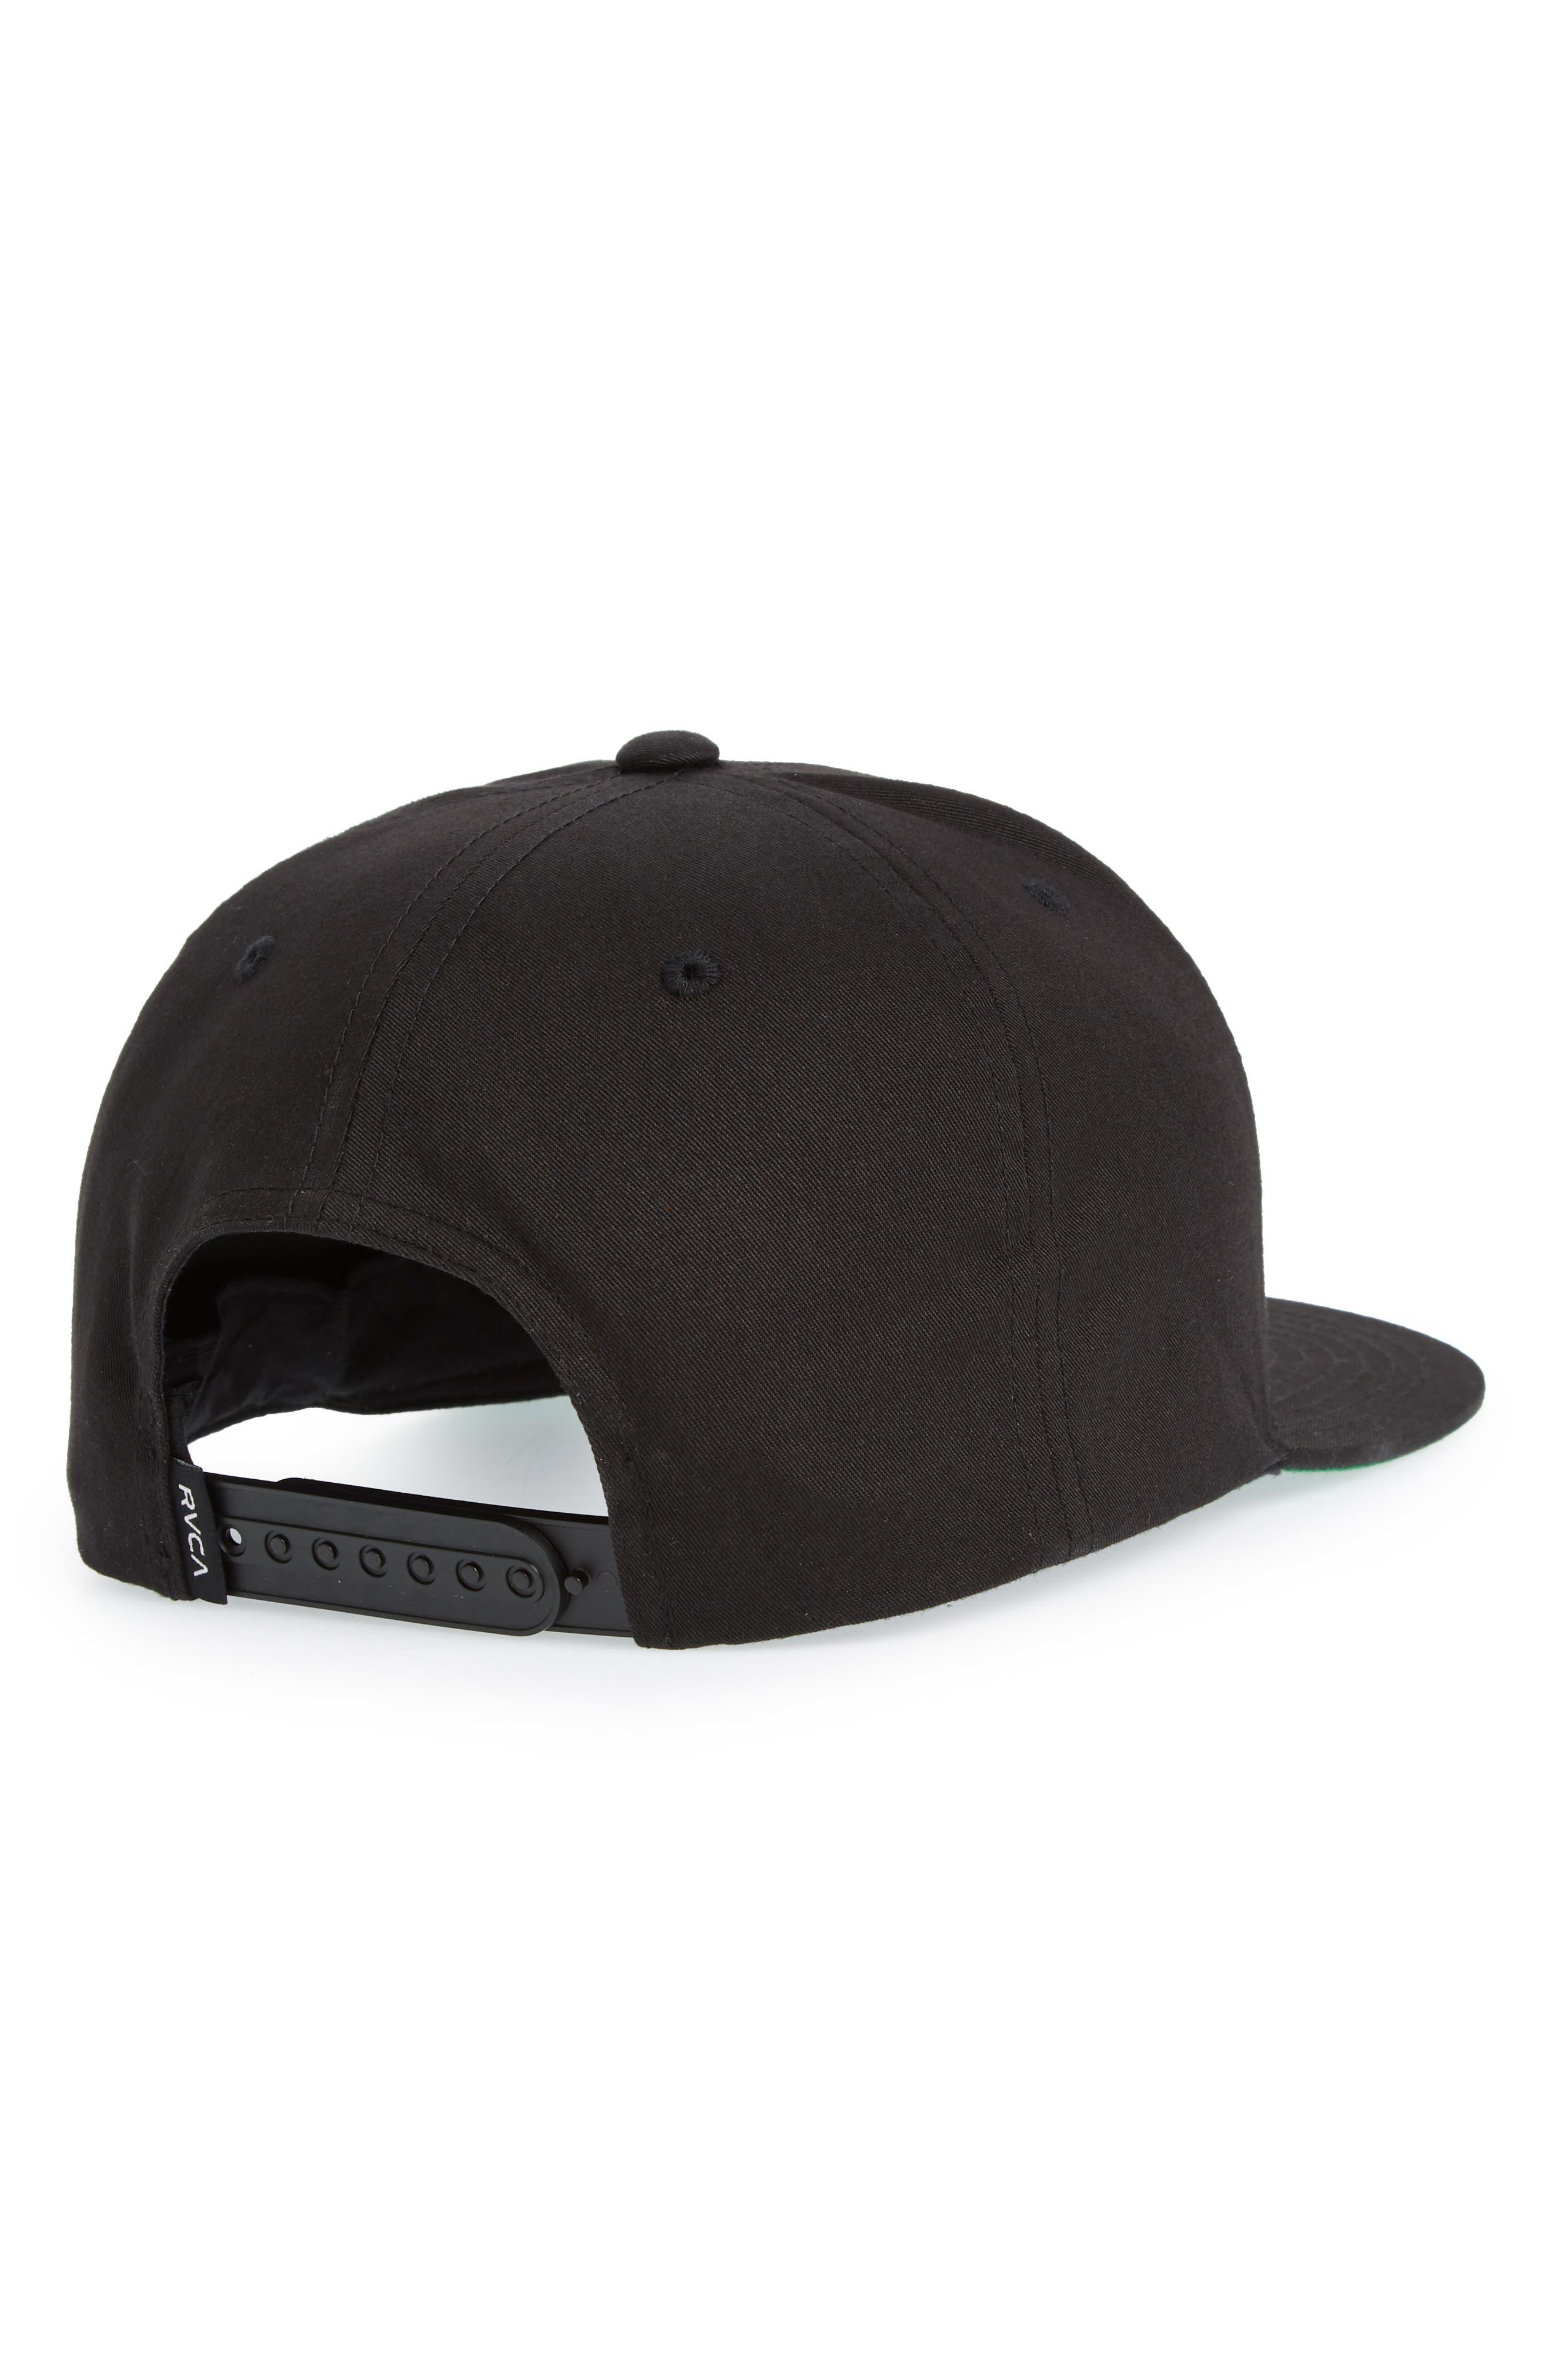 VA Snapback II Snapback Hat,                             Alternate thumbnail 2, color,                             001